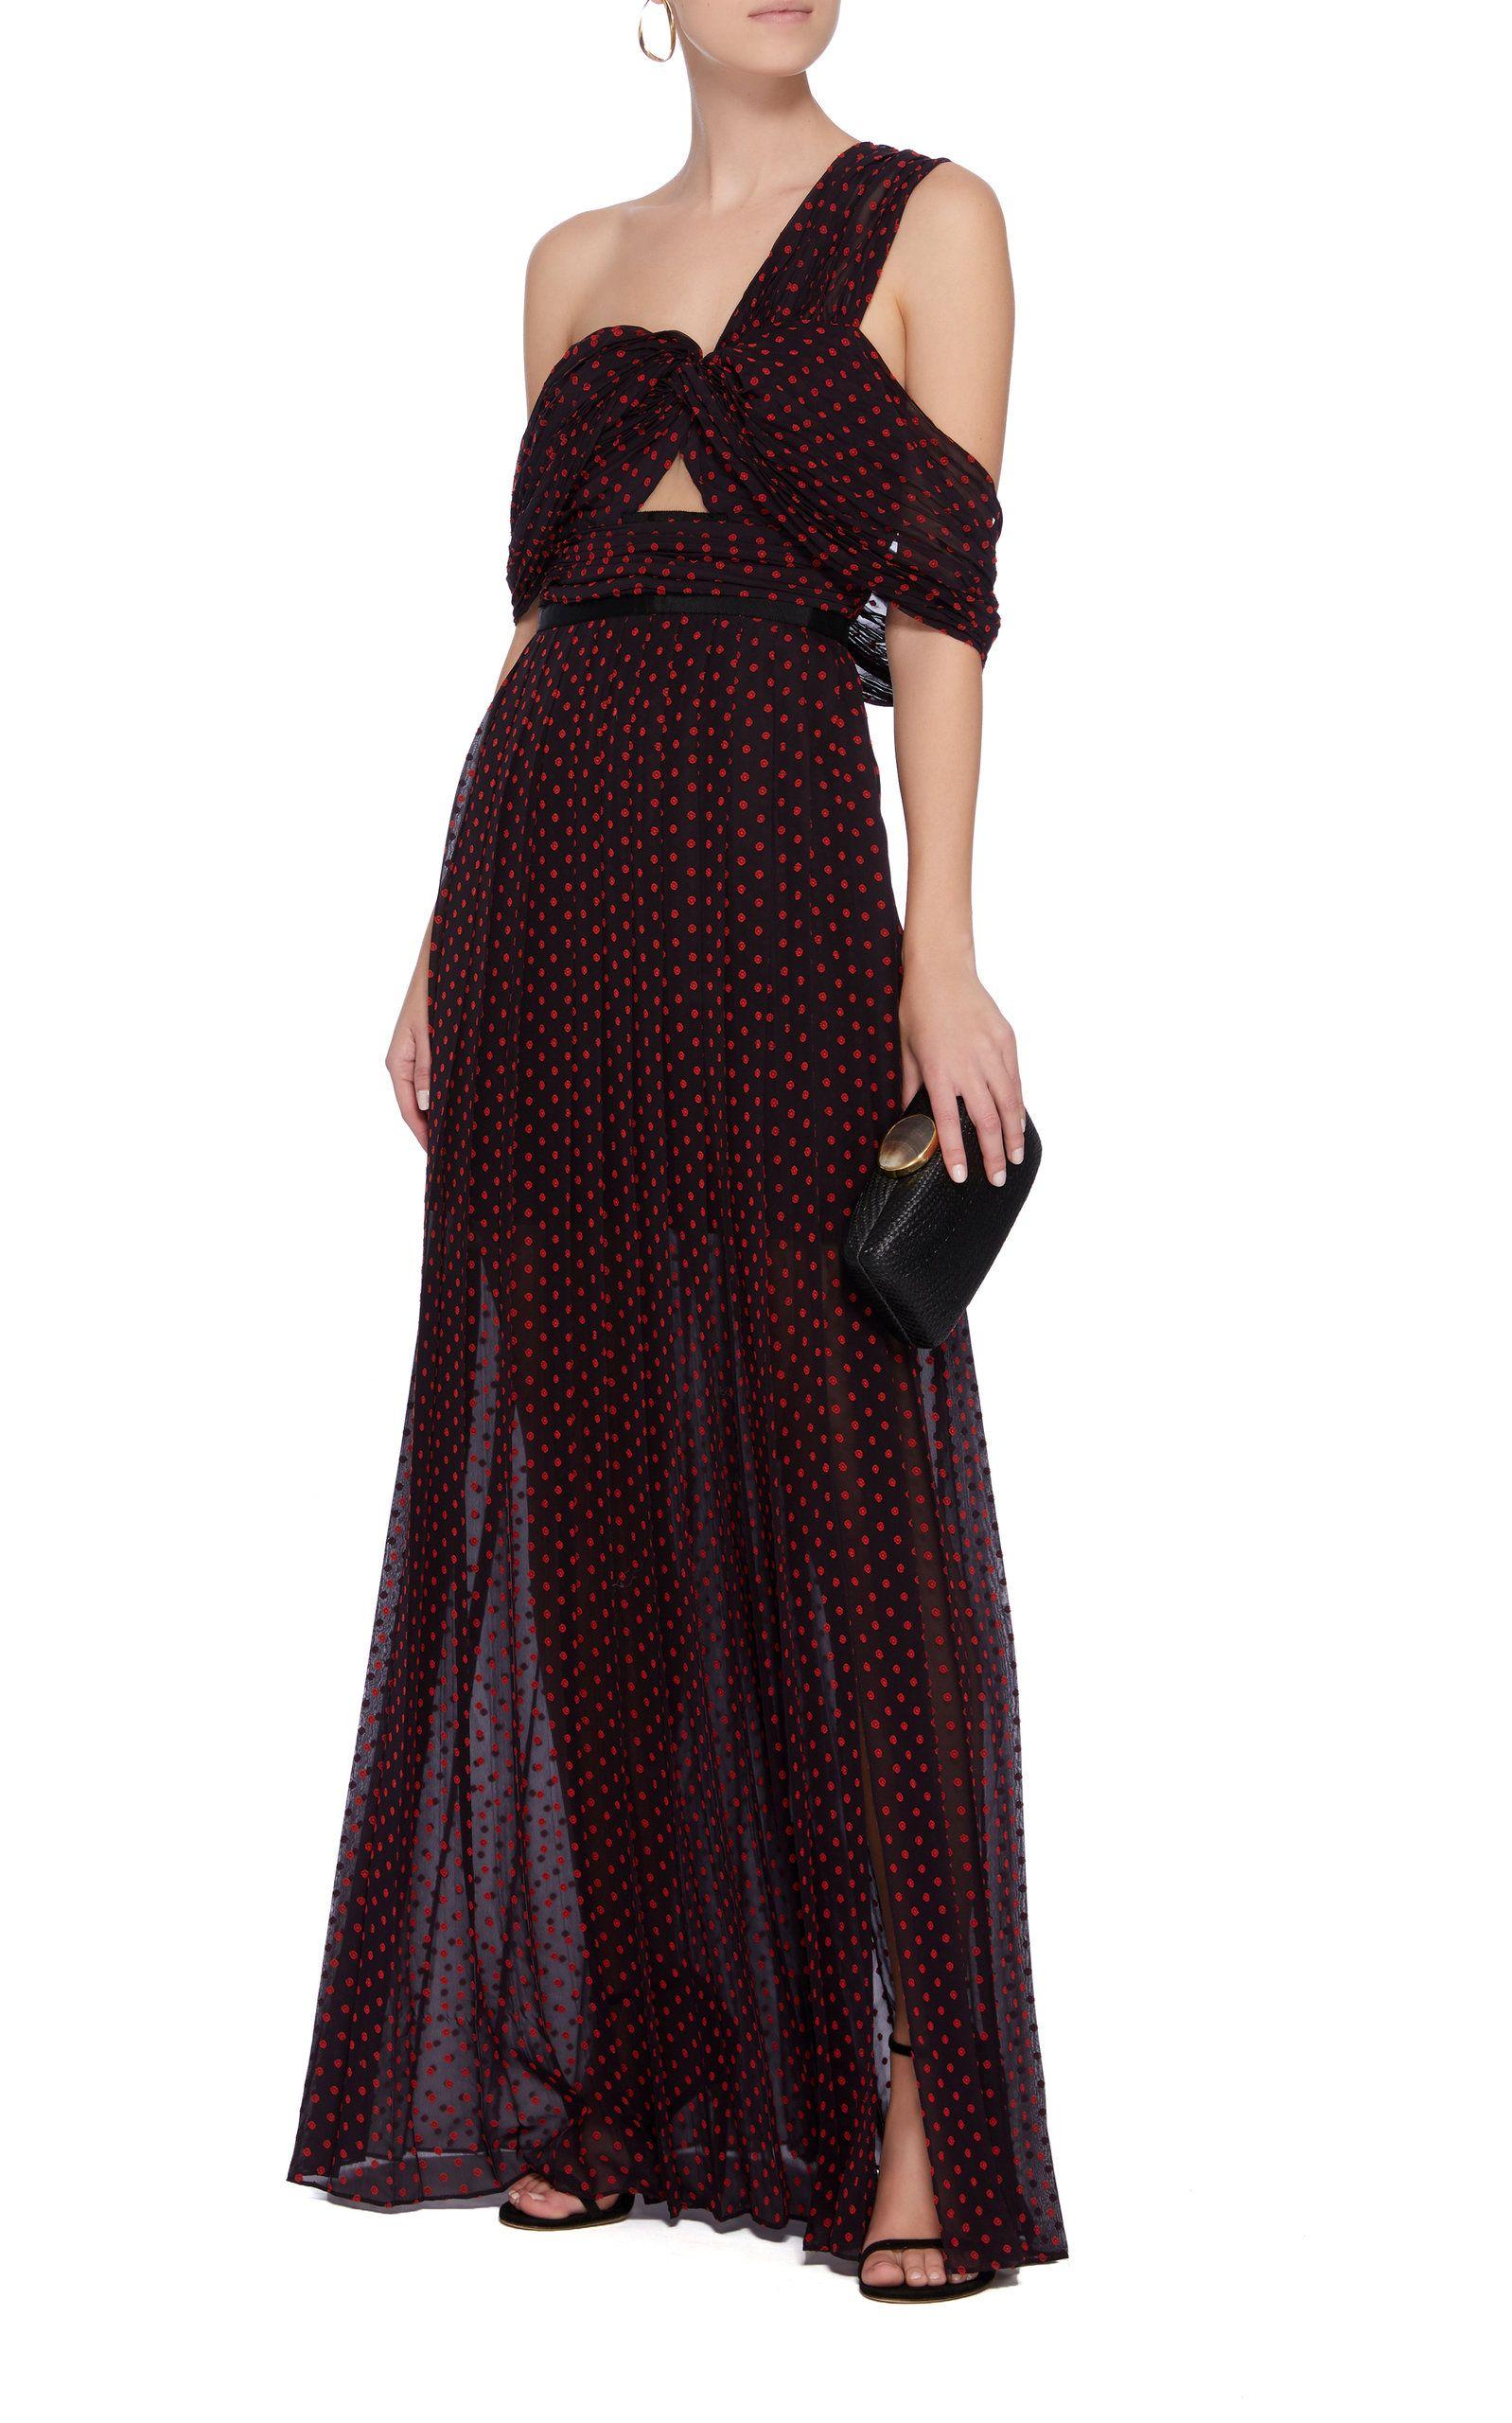 74cc1217073 Click product to zoom Self Portrait Dress